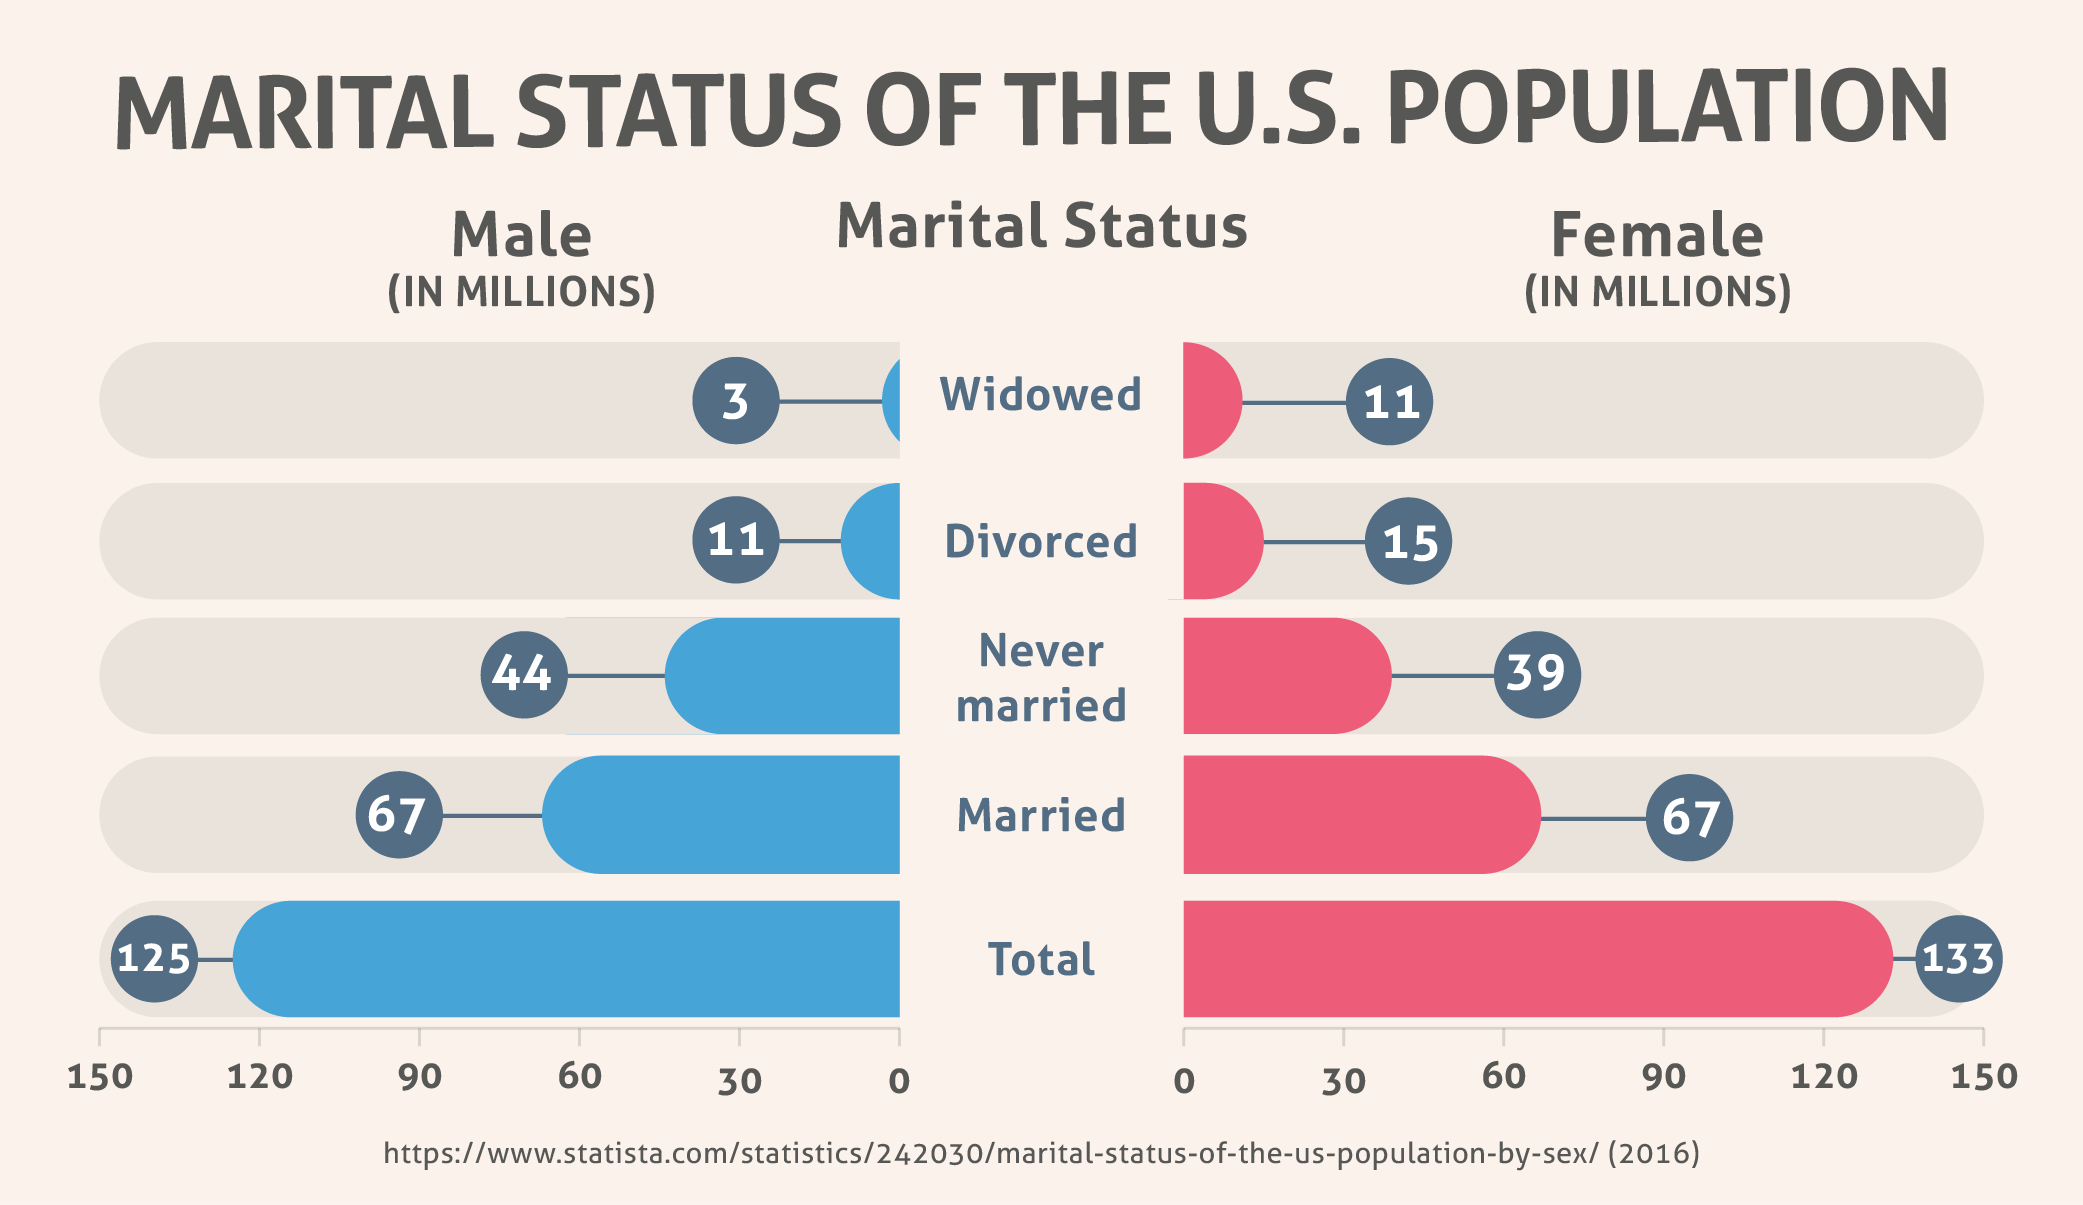 Marital Status of the U.S. Population